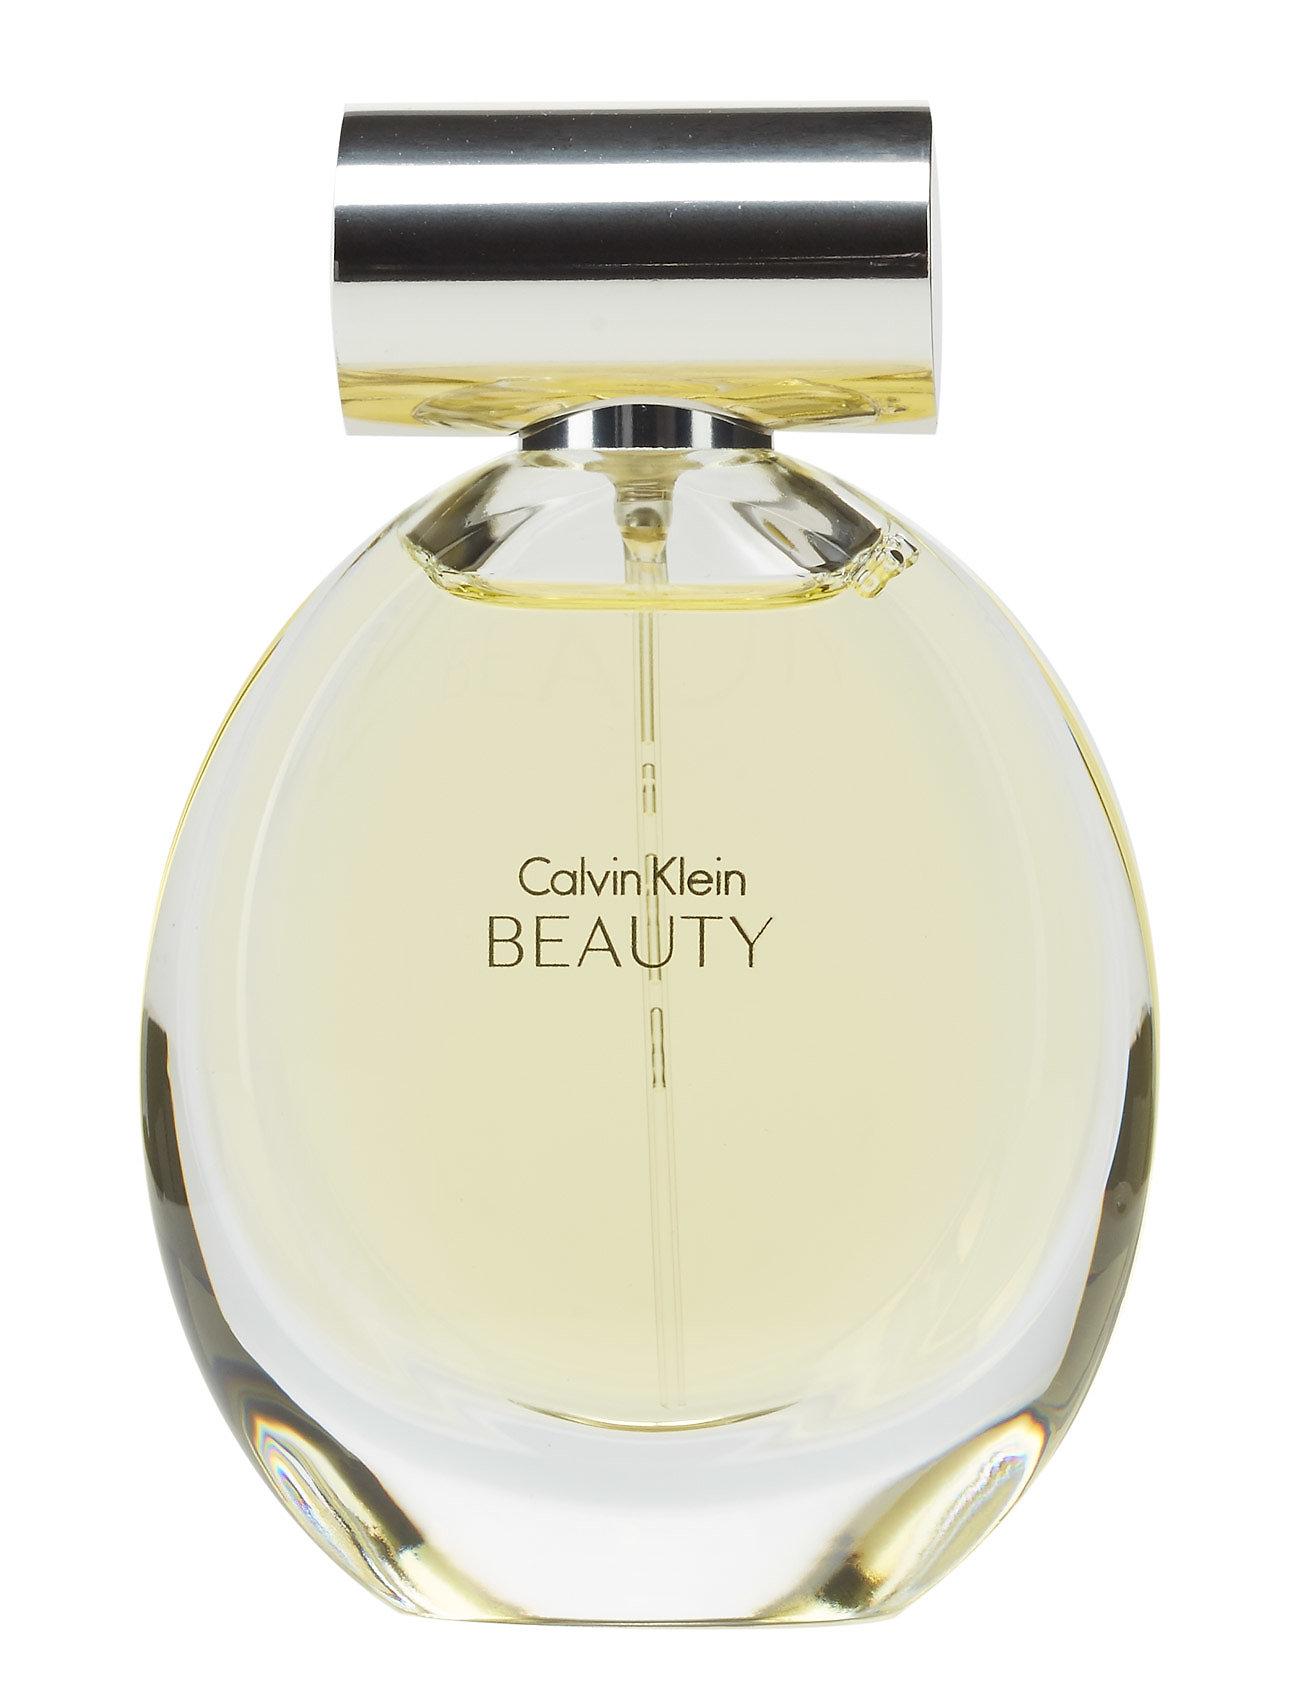 Beauty Eau De Parfum Calvin Klein Fragrance  til Damer i